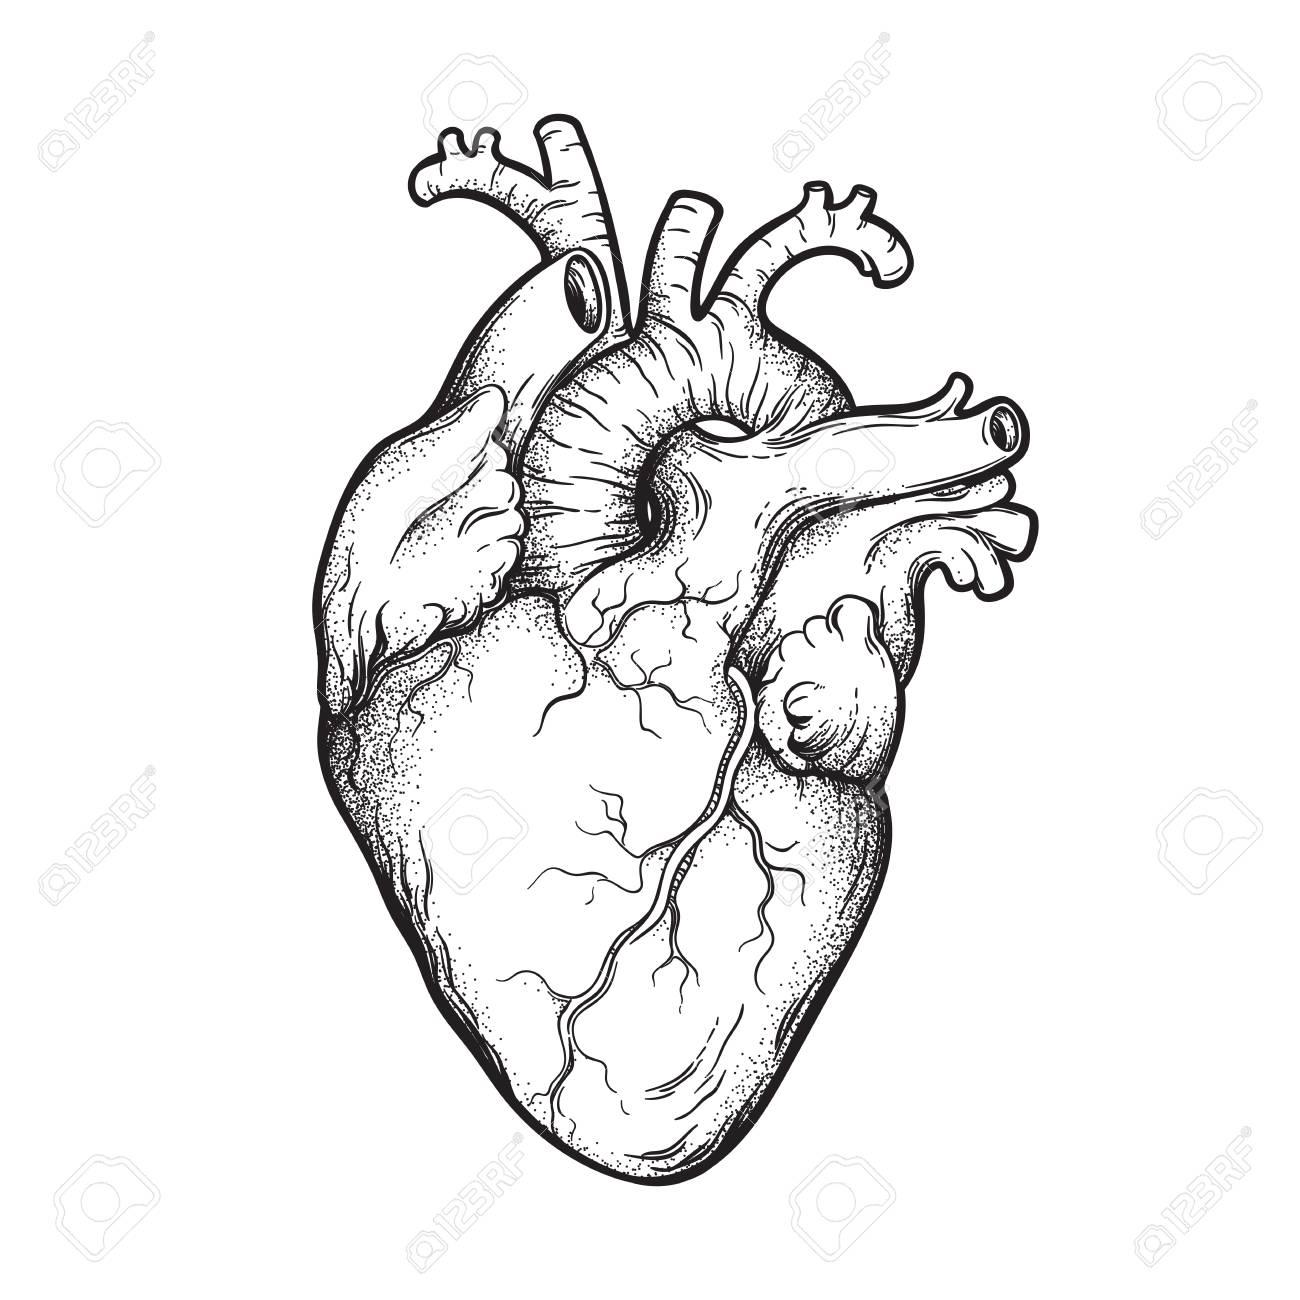 Human heart anatomically correct hand drawn line art and dotwork. Flash tattoo or print design vector illustration - 104274088